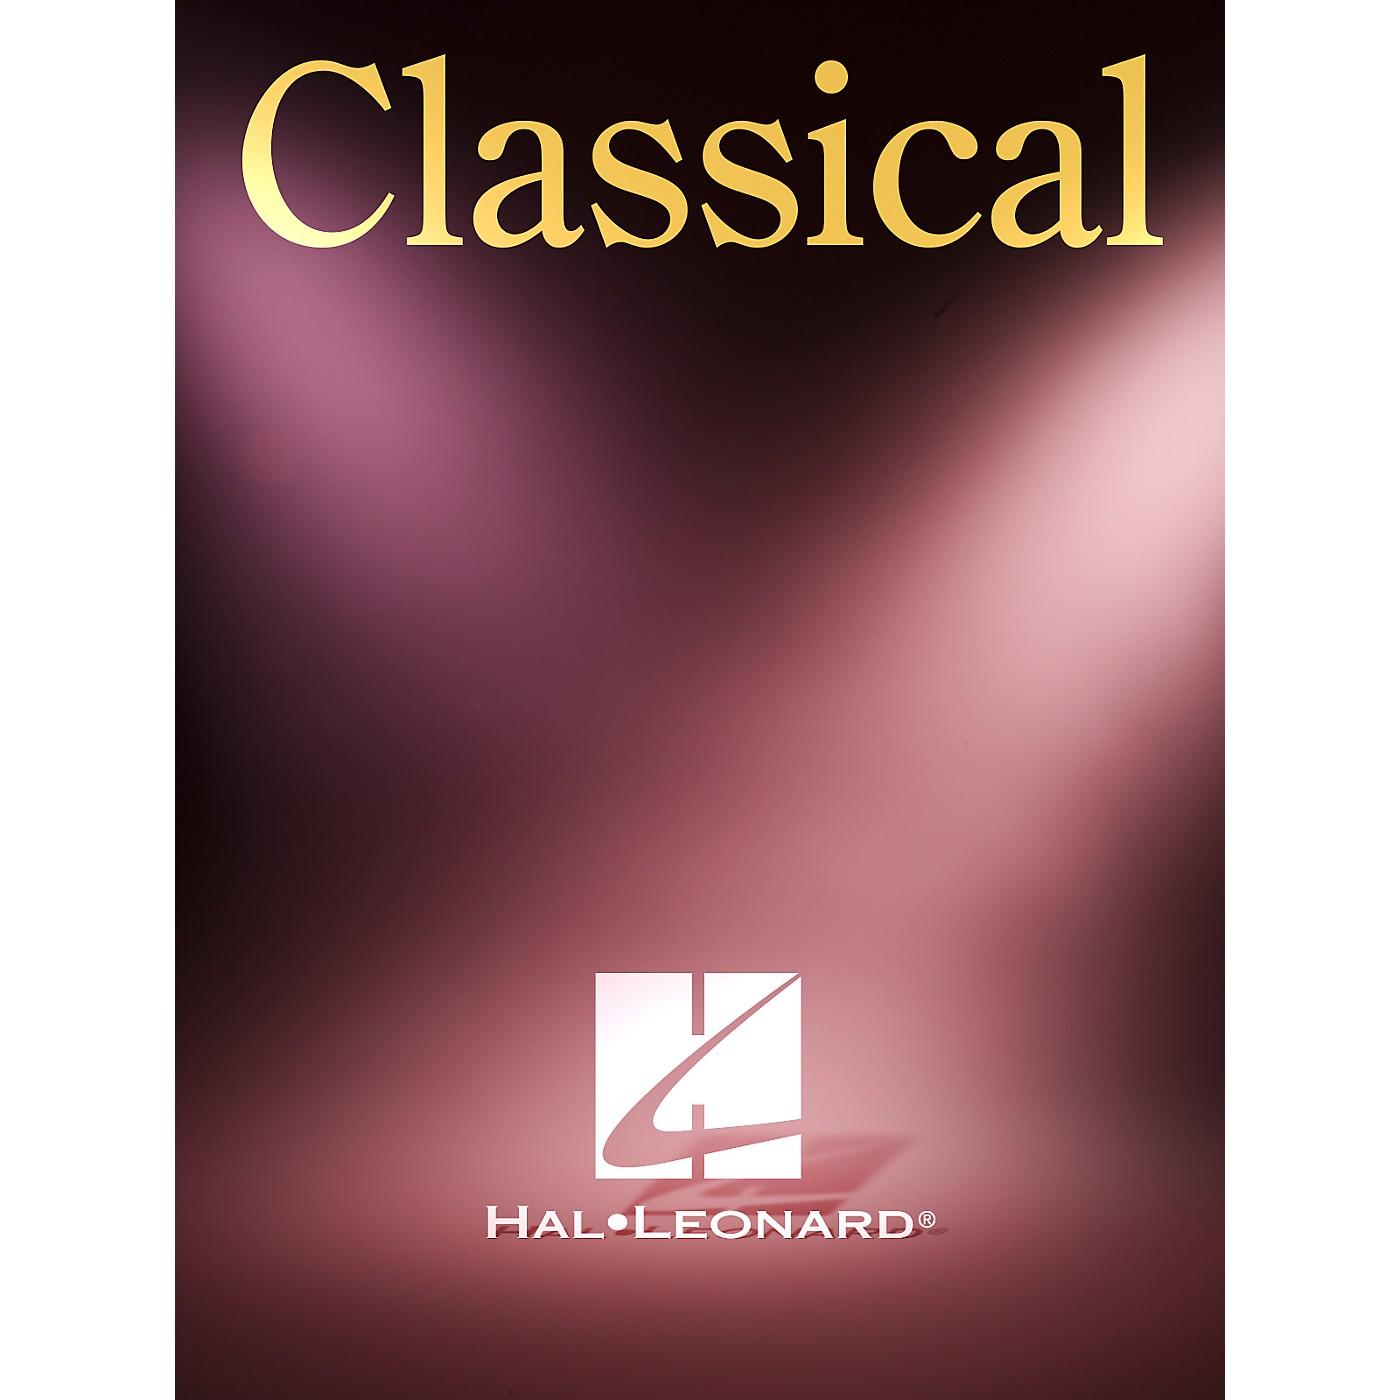 Hal Leonard Canzoni Suvini Zerboni Series thumbnail